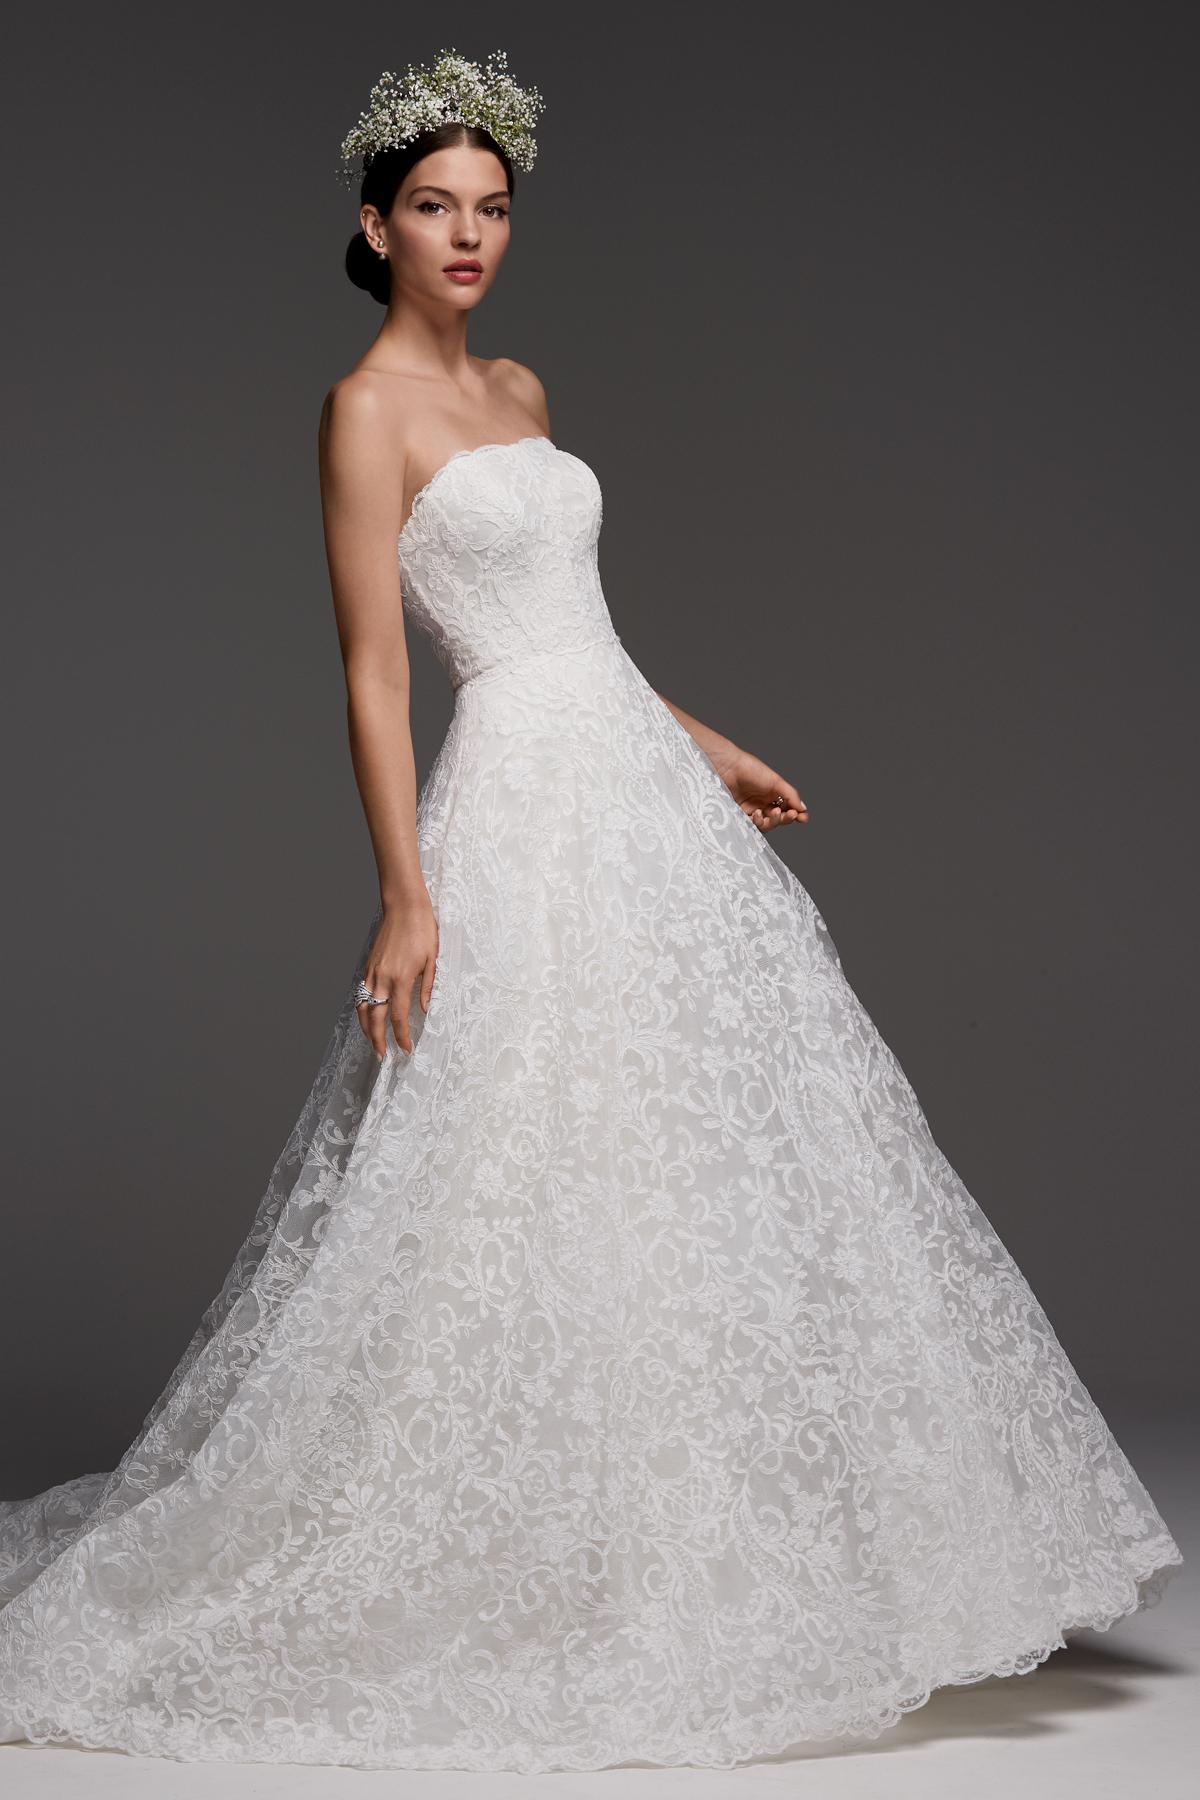 watters wedding dress fall 2018 a-line strapless